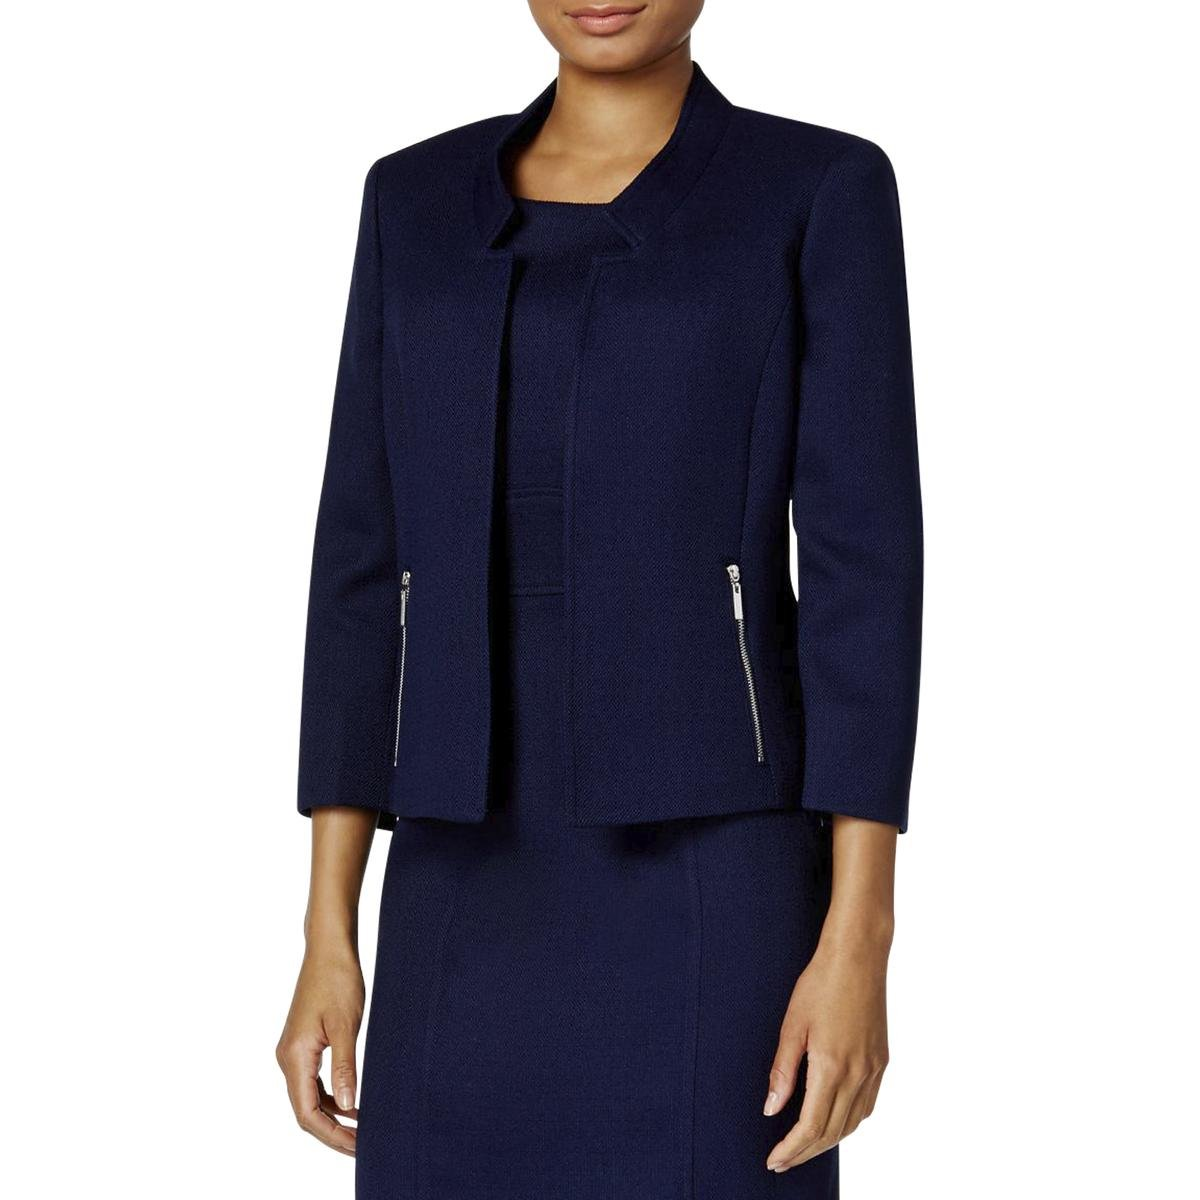 Kasper Women's Petite Size Mandarin Collar Textured Flyaway Jacket, Bright Navy, 6P by Kasper